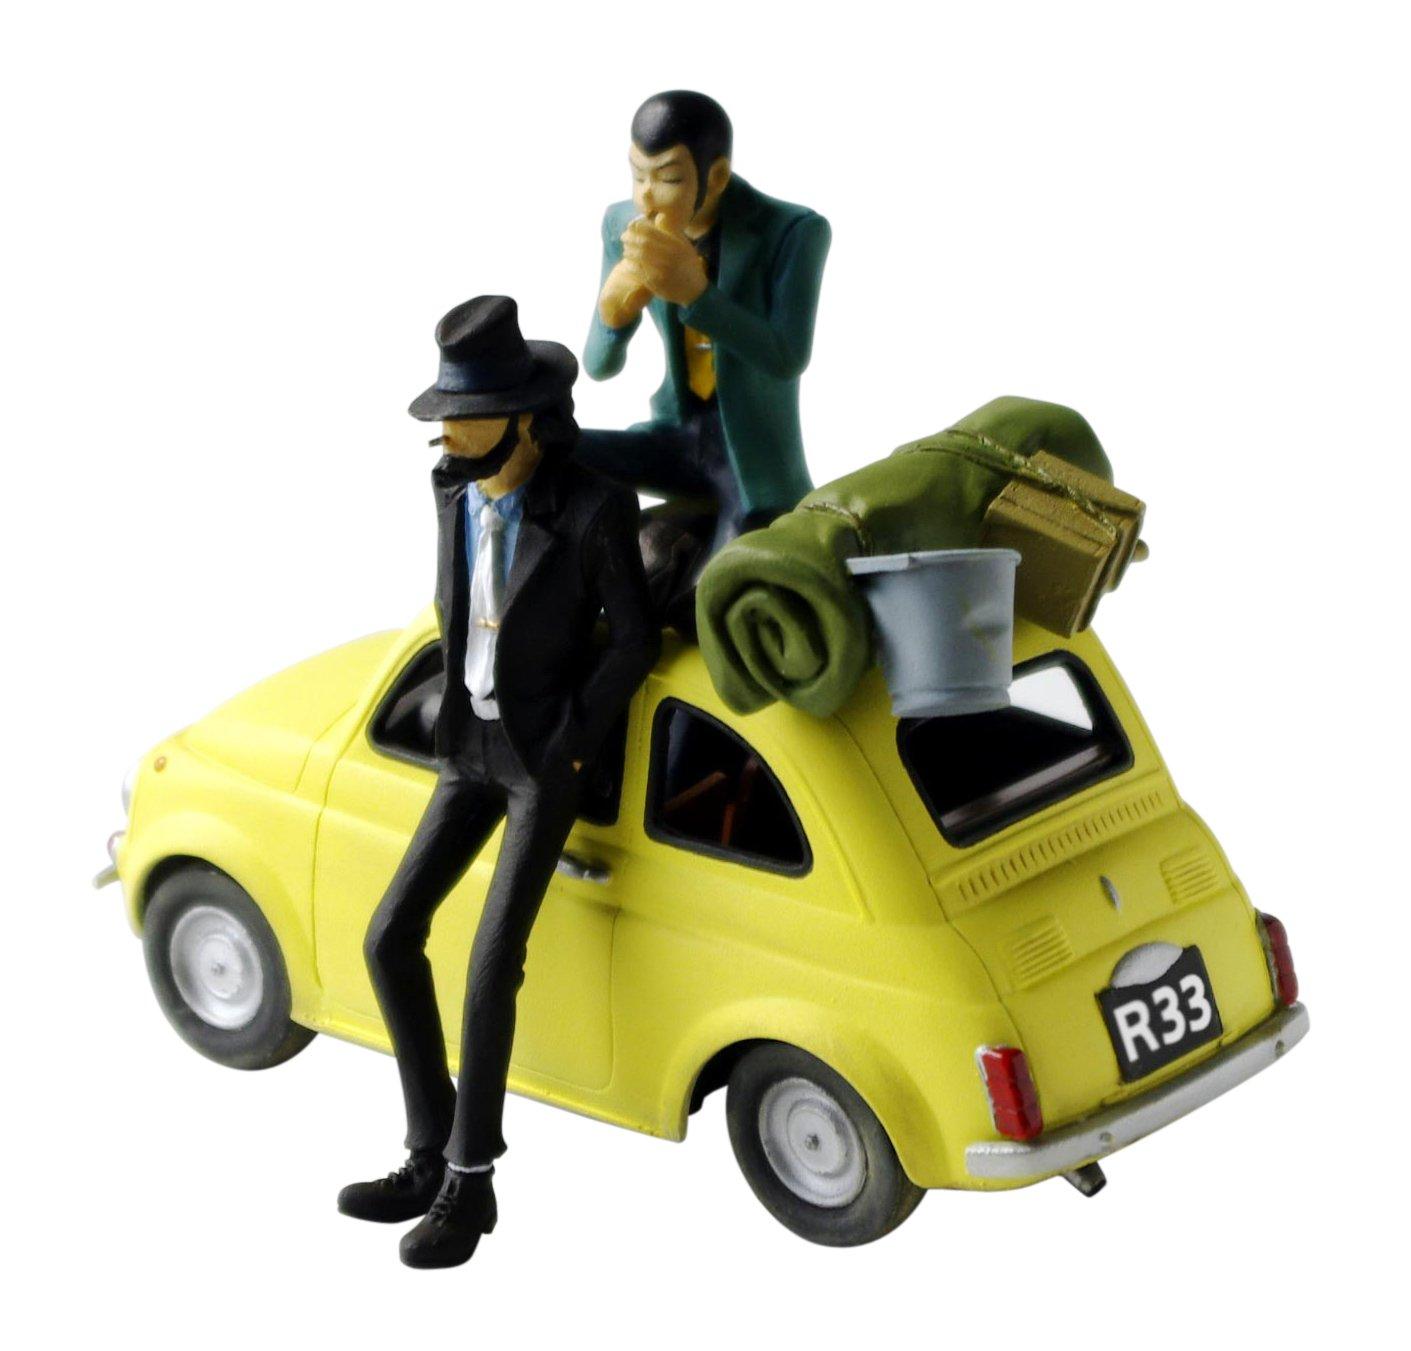 Lupin III - Treasure On Desk Figure act. 2 [Tabiji] Lupin and Jigen (japan import)